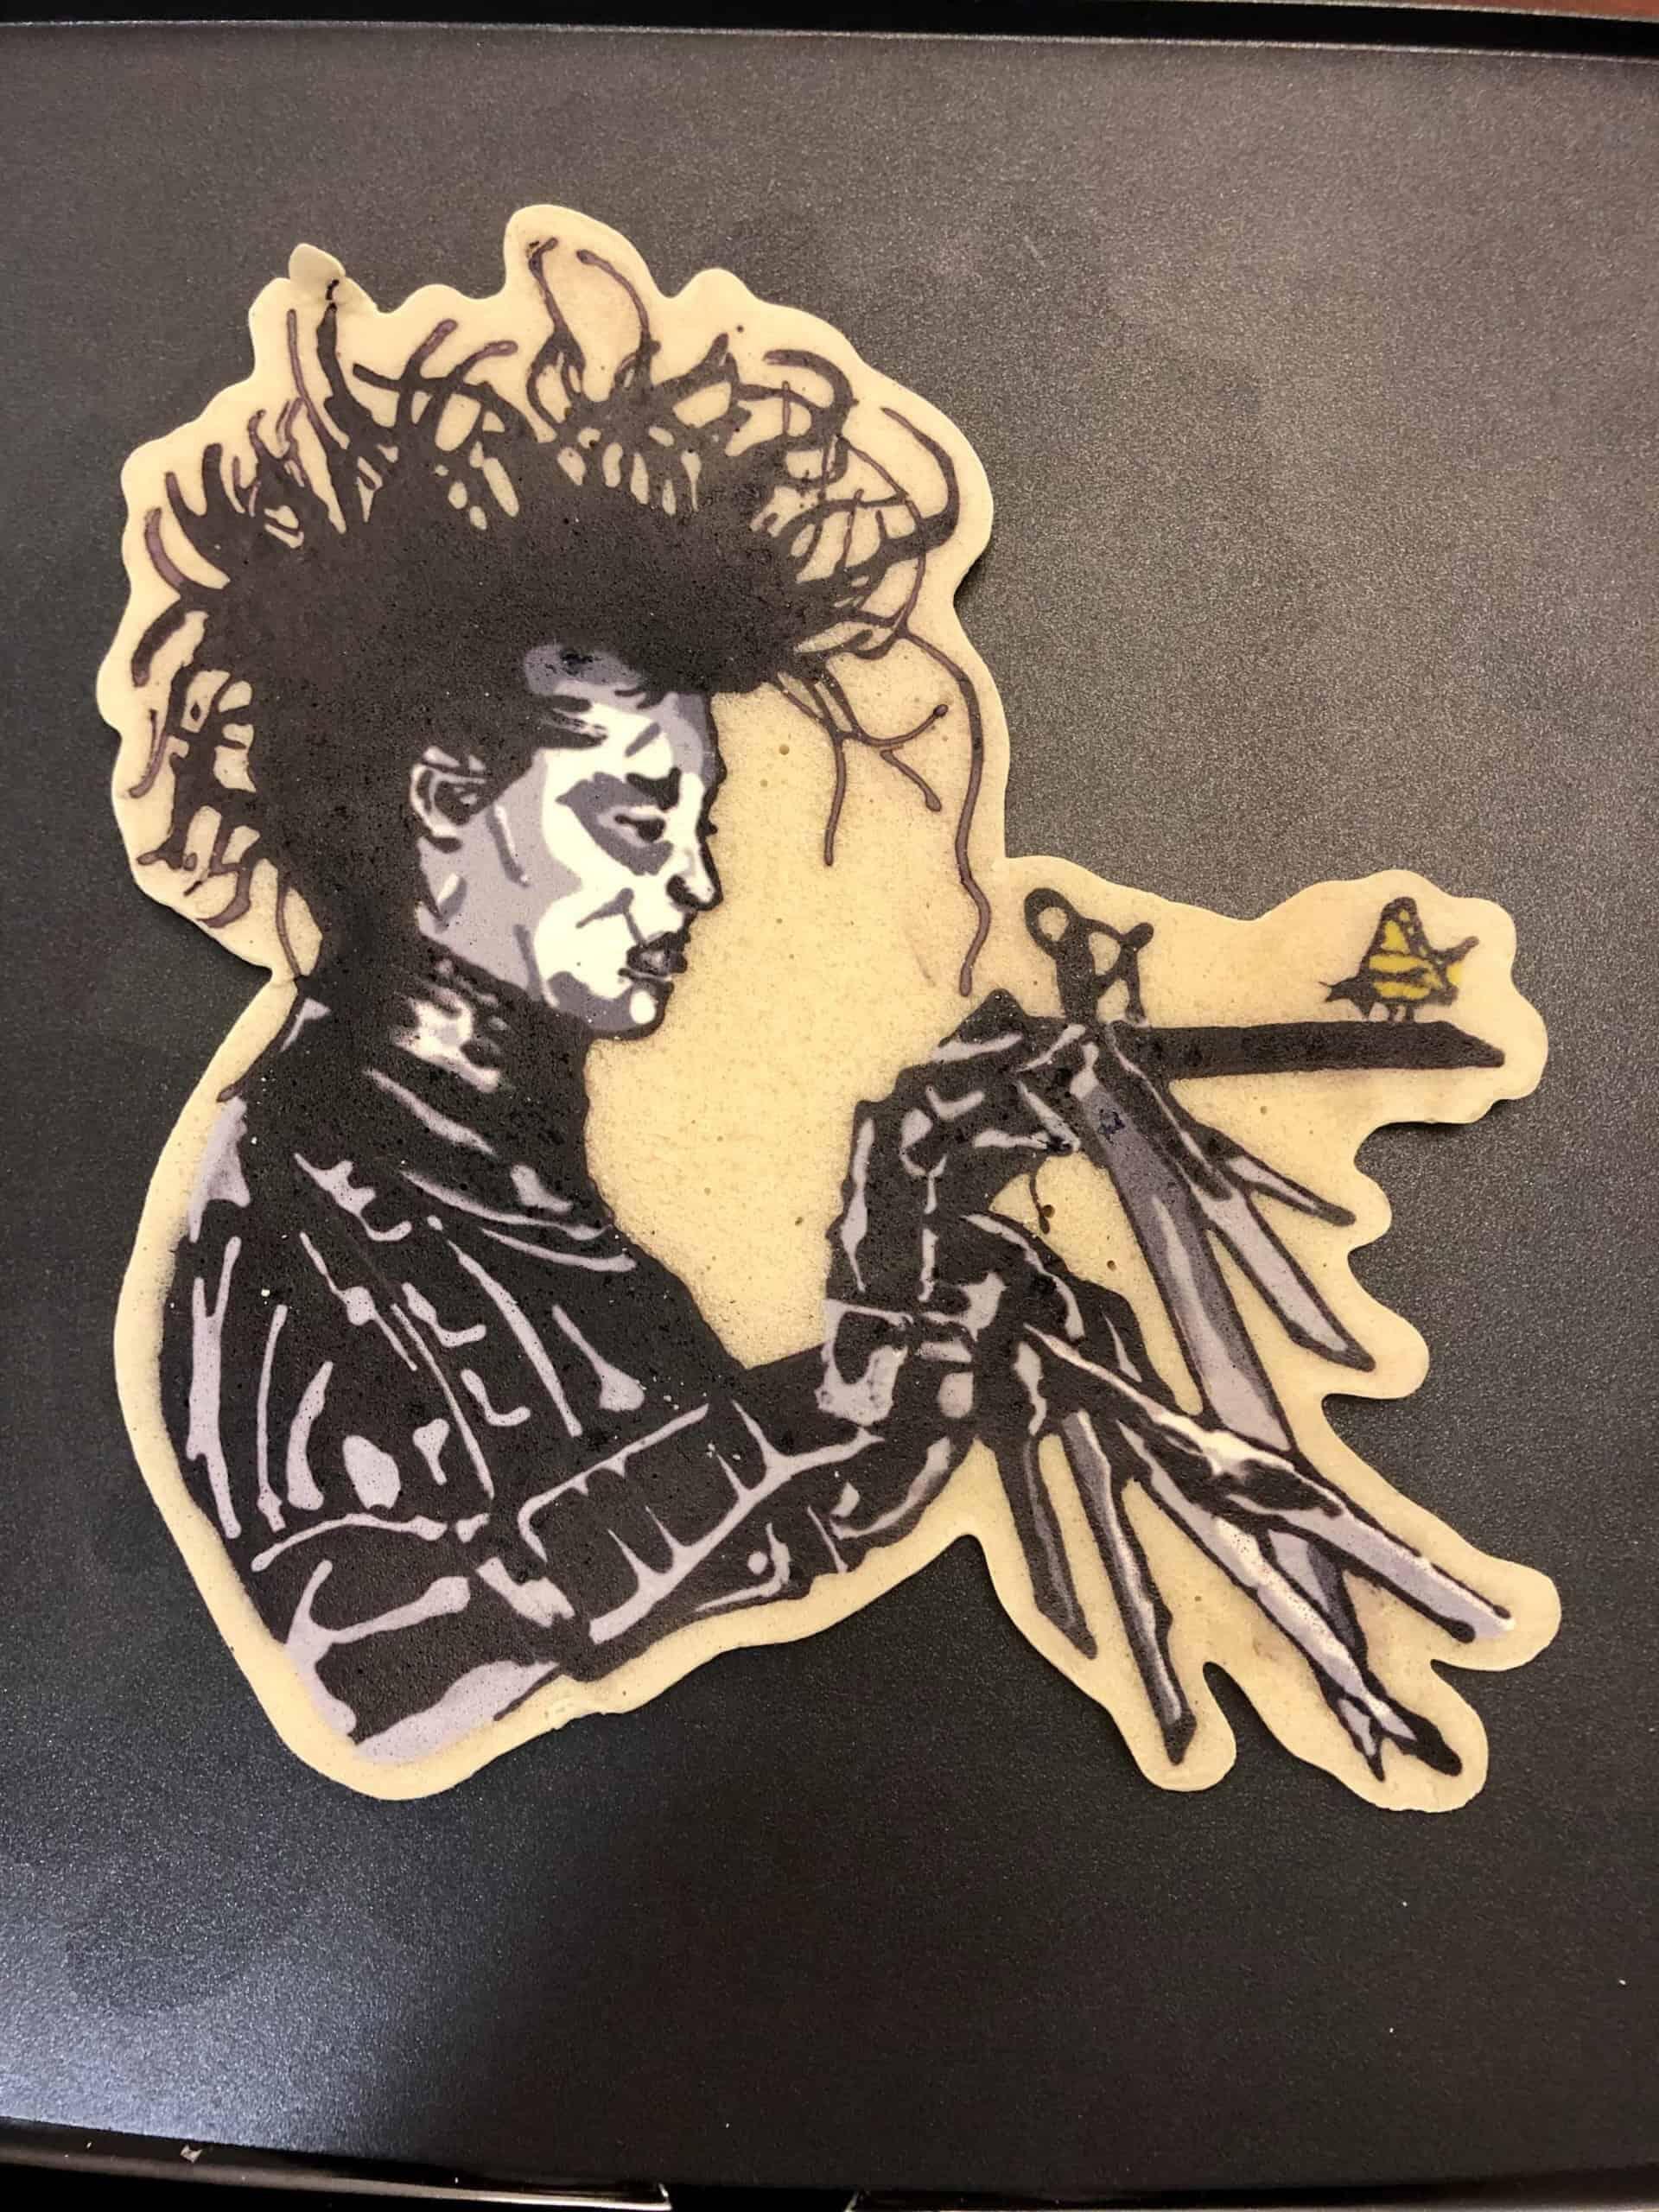 Edward Scissorhands Pancake Art